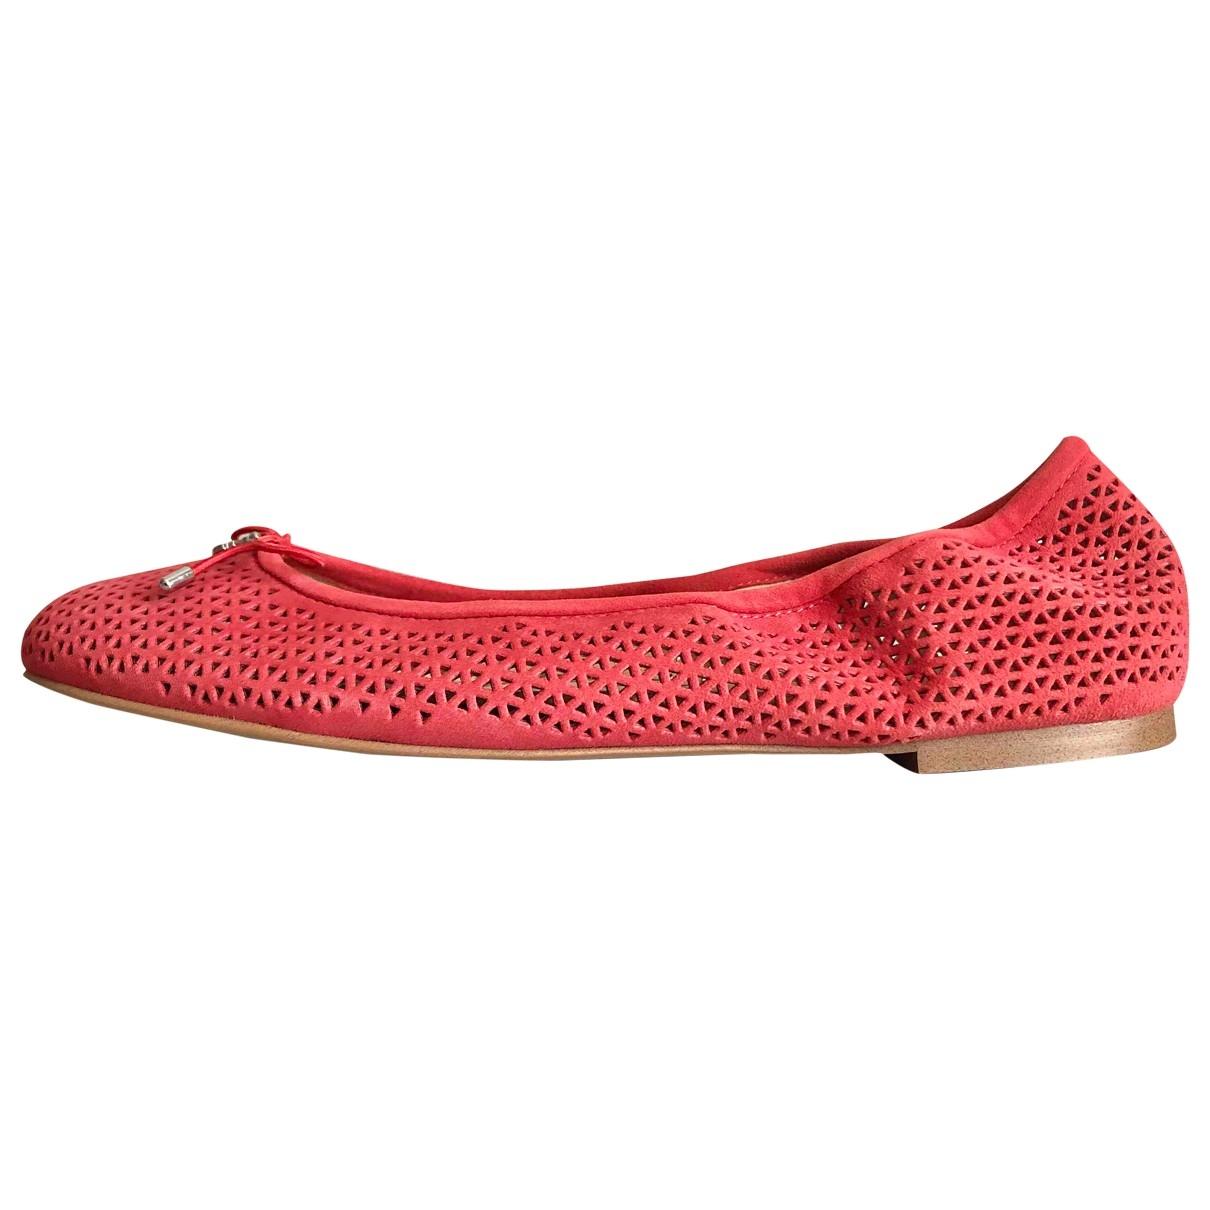 Sam Edelman \N Pink Suede Ballet flats for Women 9 US